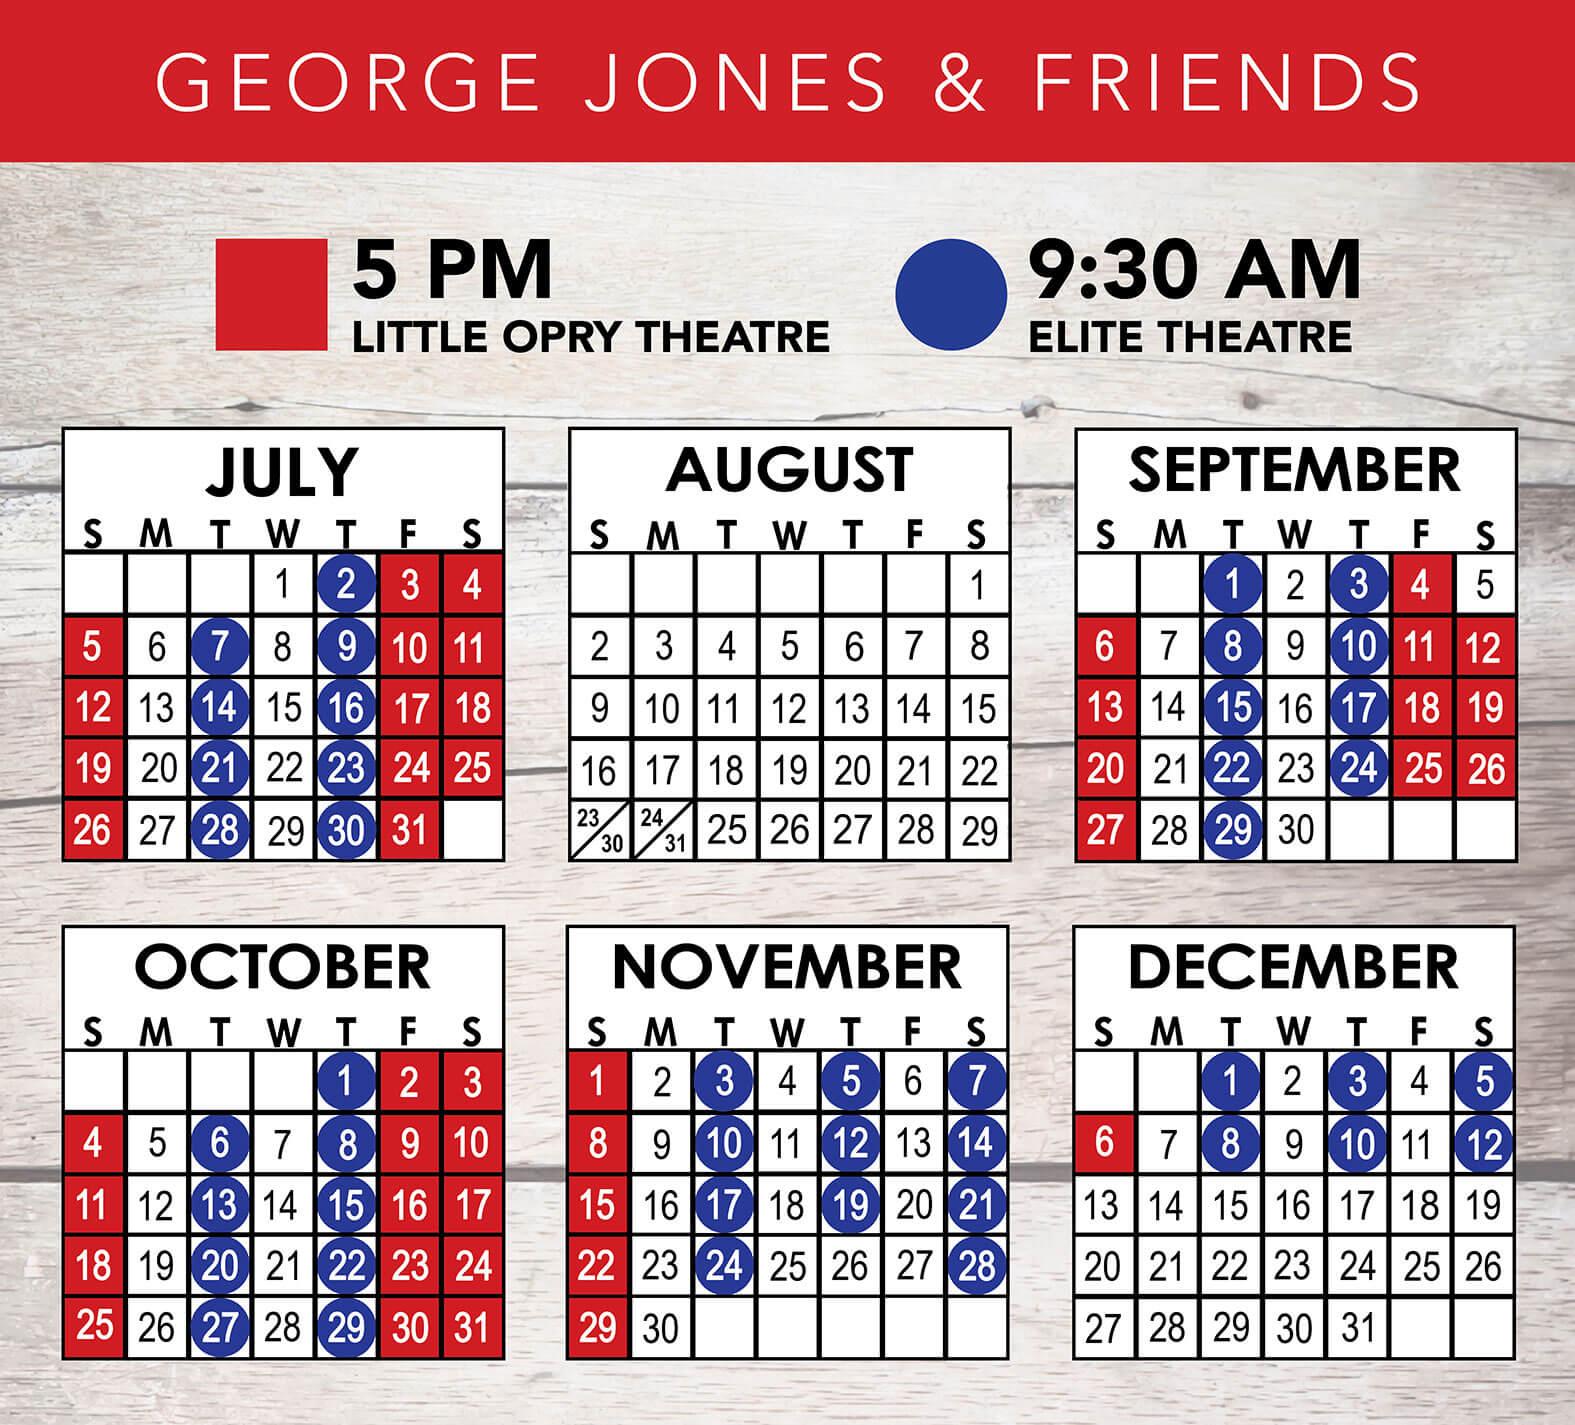 George Jones & Friends 2020 Calendar